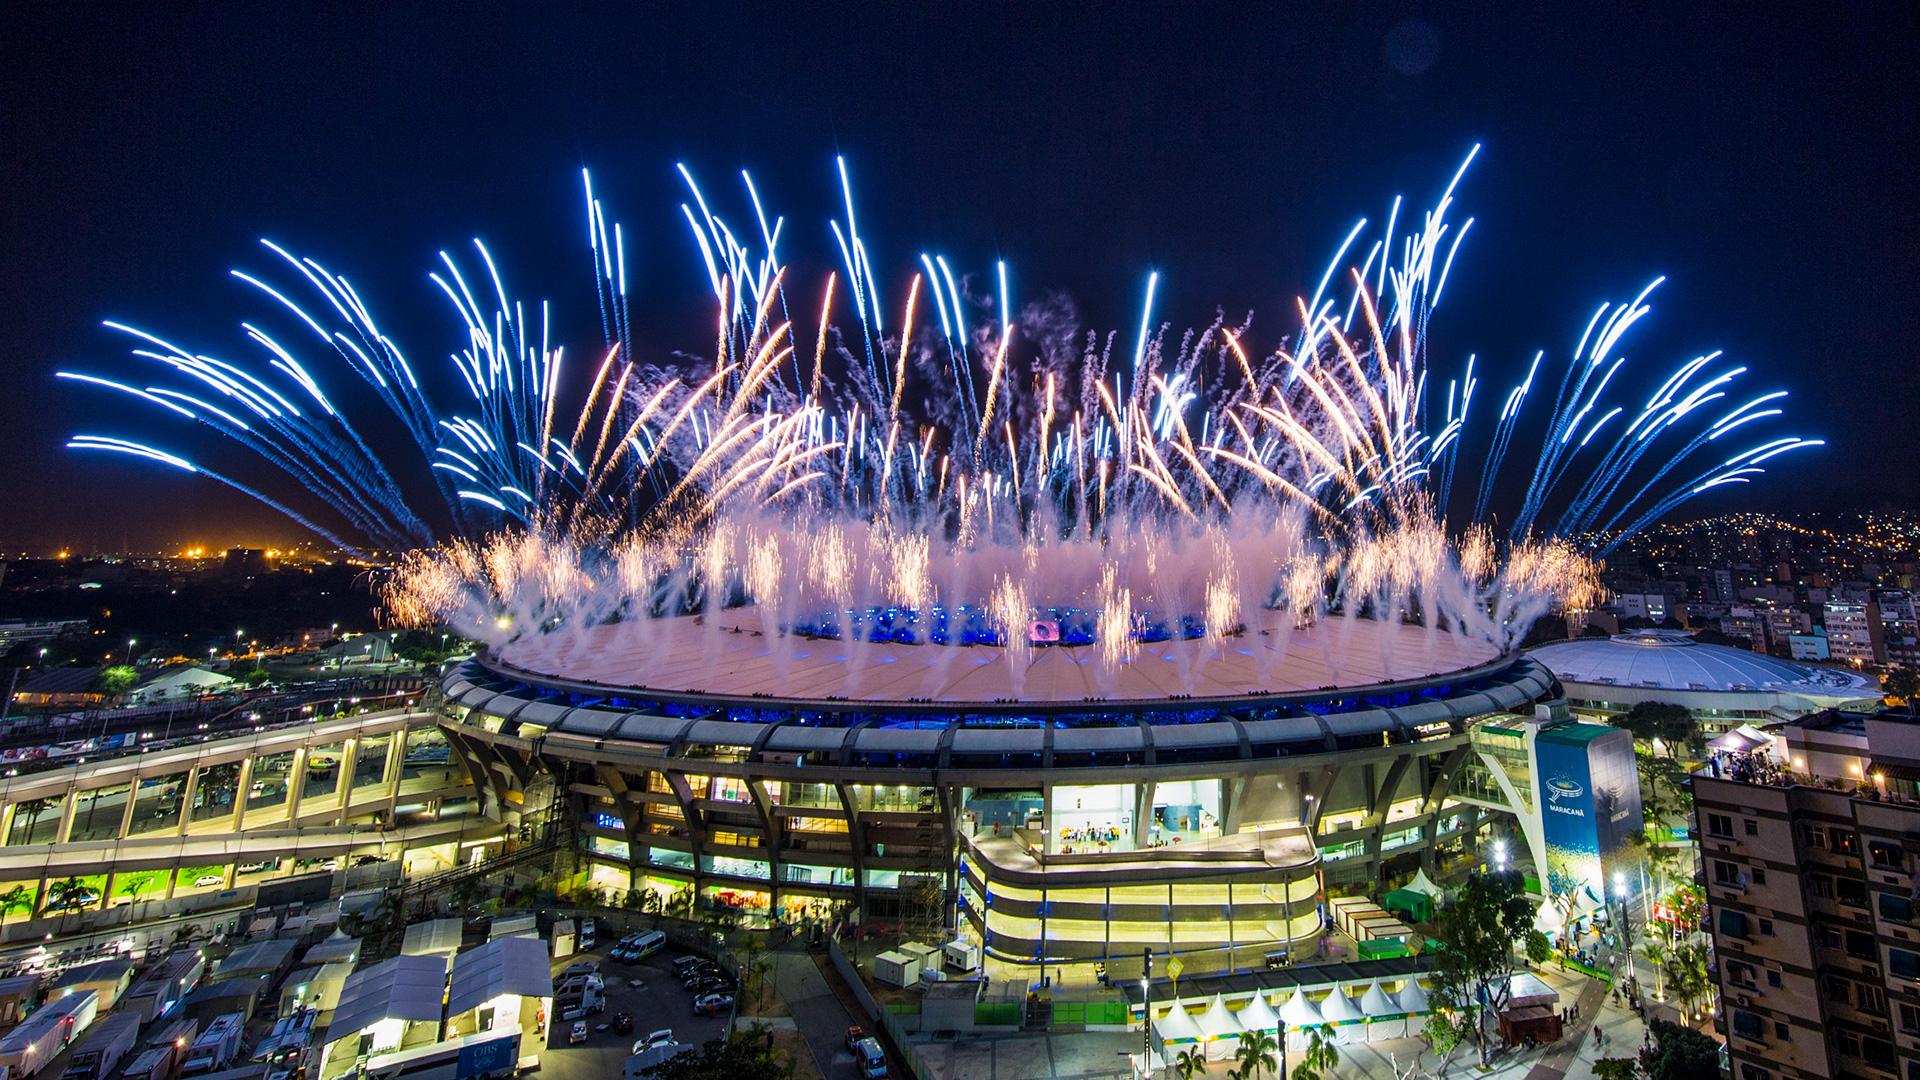 1984 nfl season results 2016 olympics